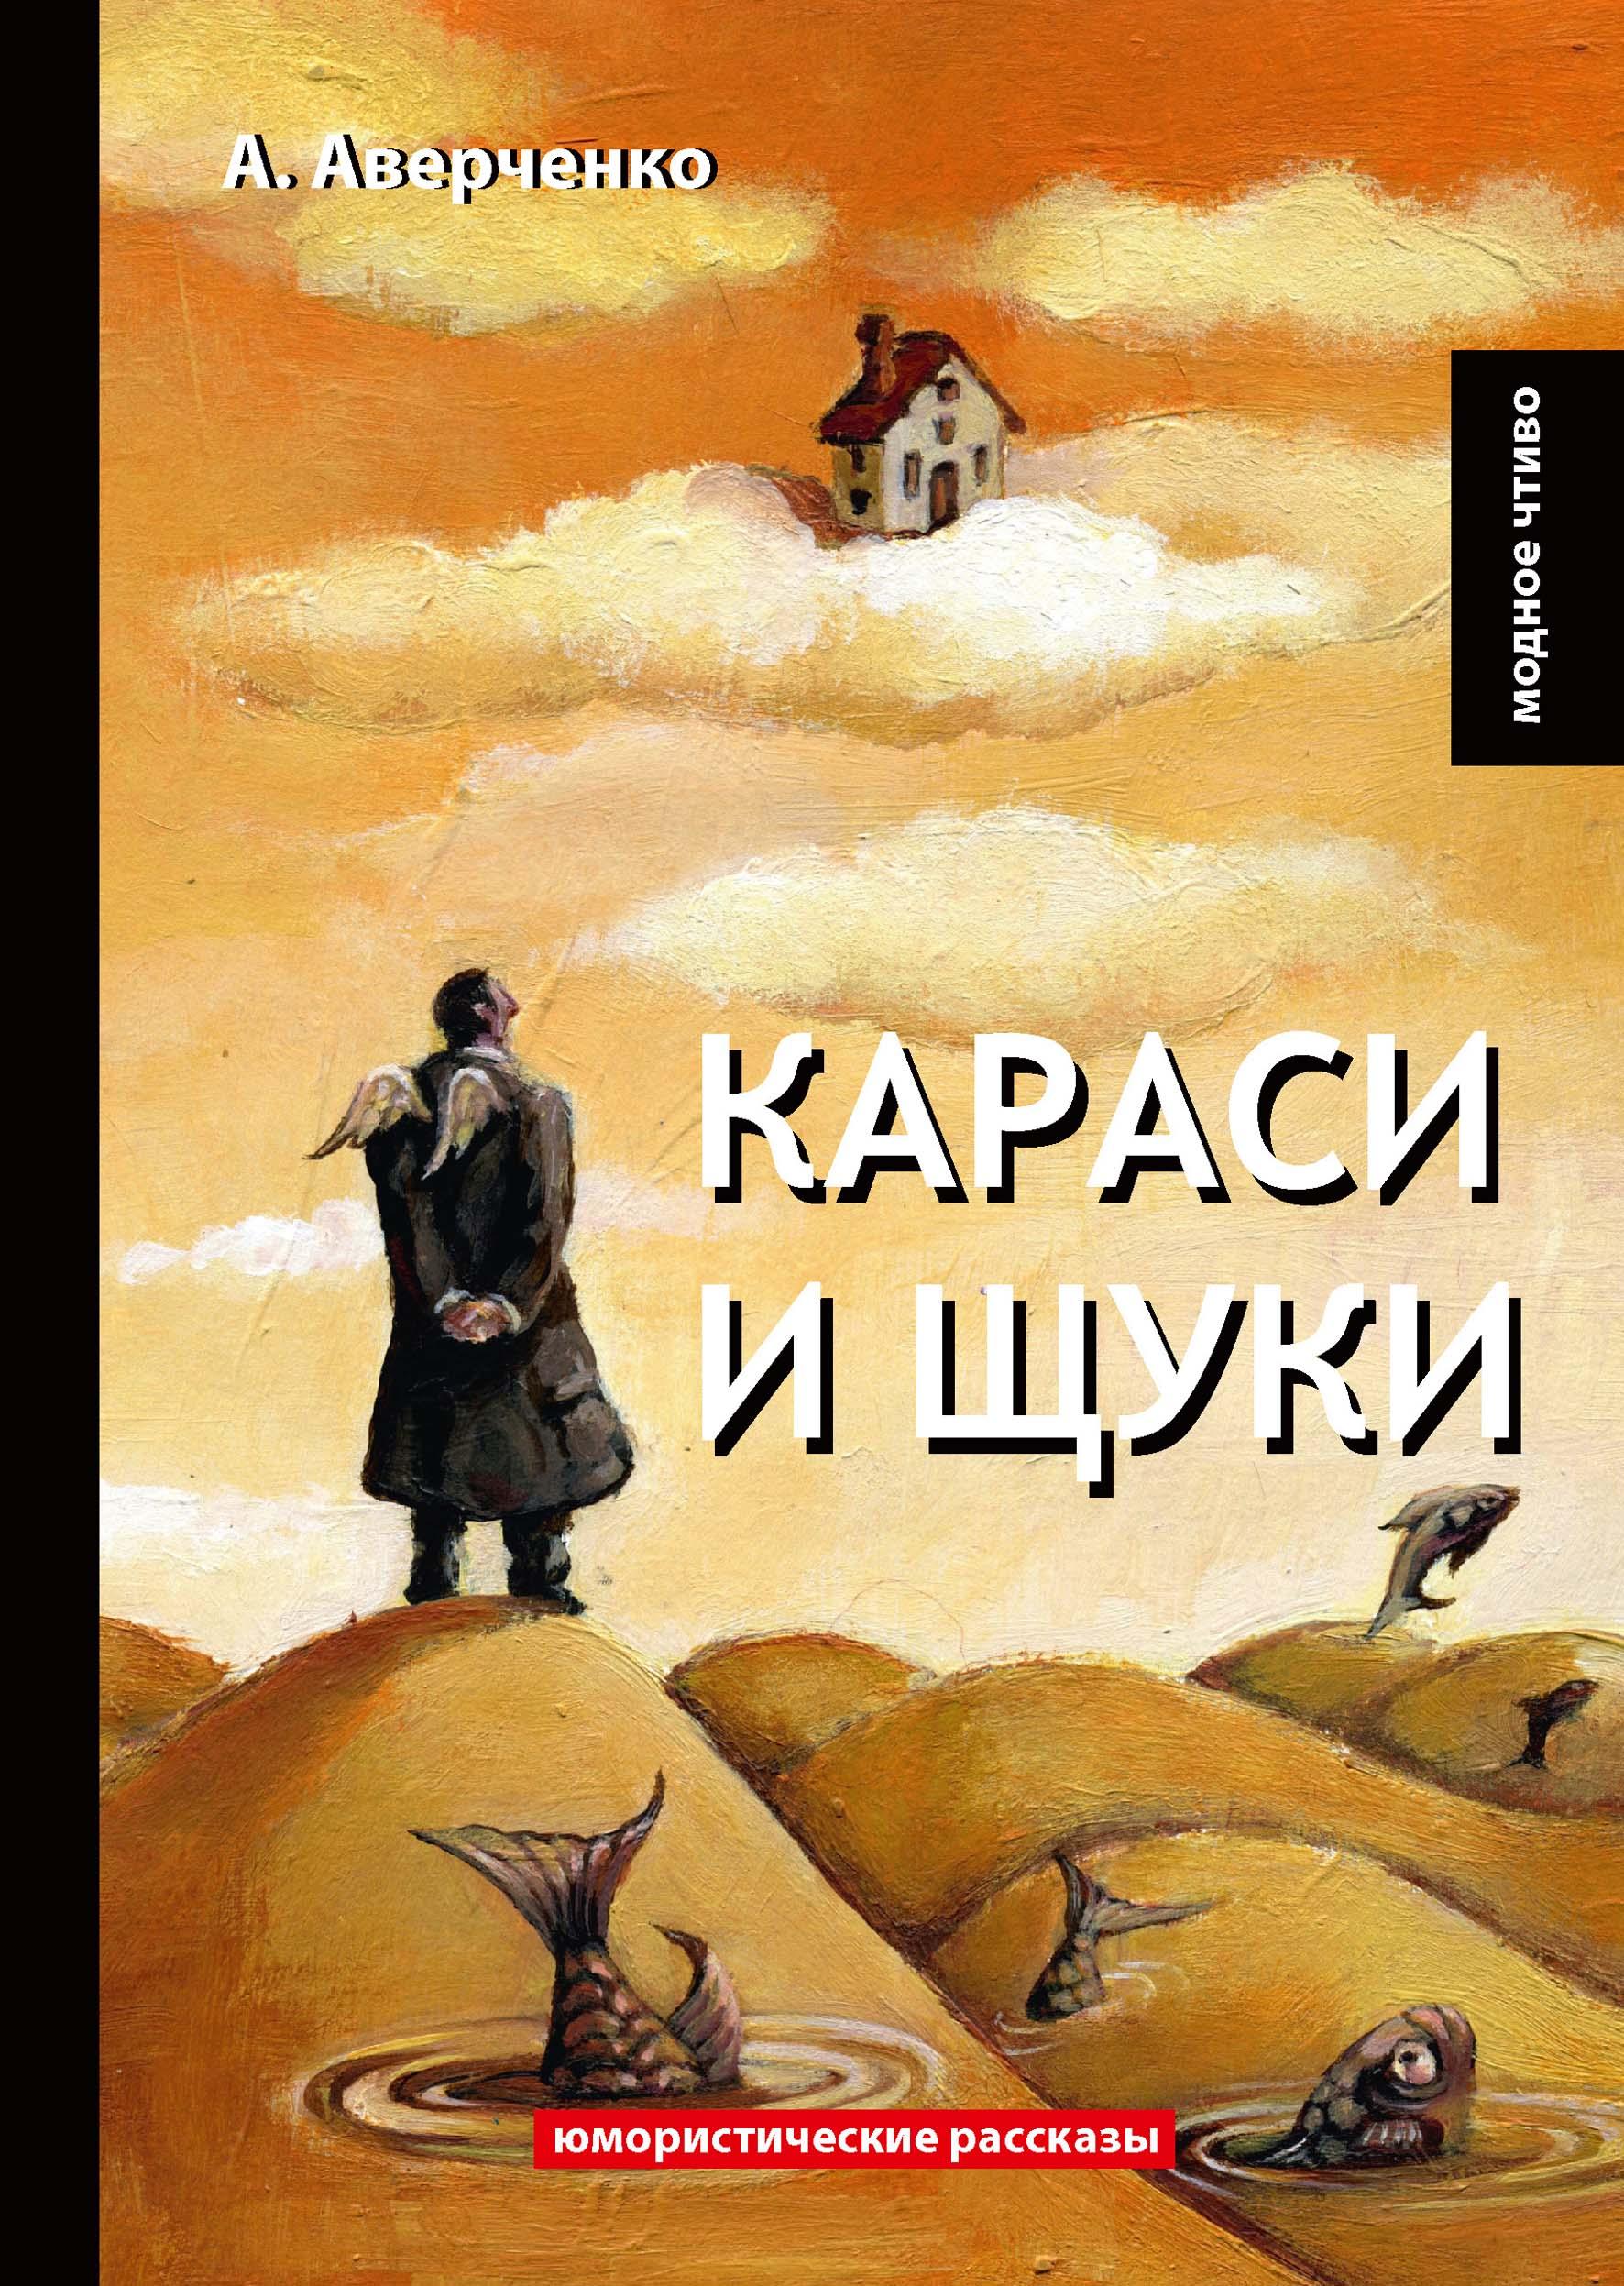 А. Аверченко Караси и щуки аверченко и двое других 2019 09 24t19 00